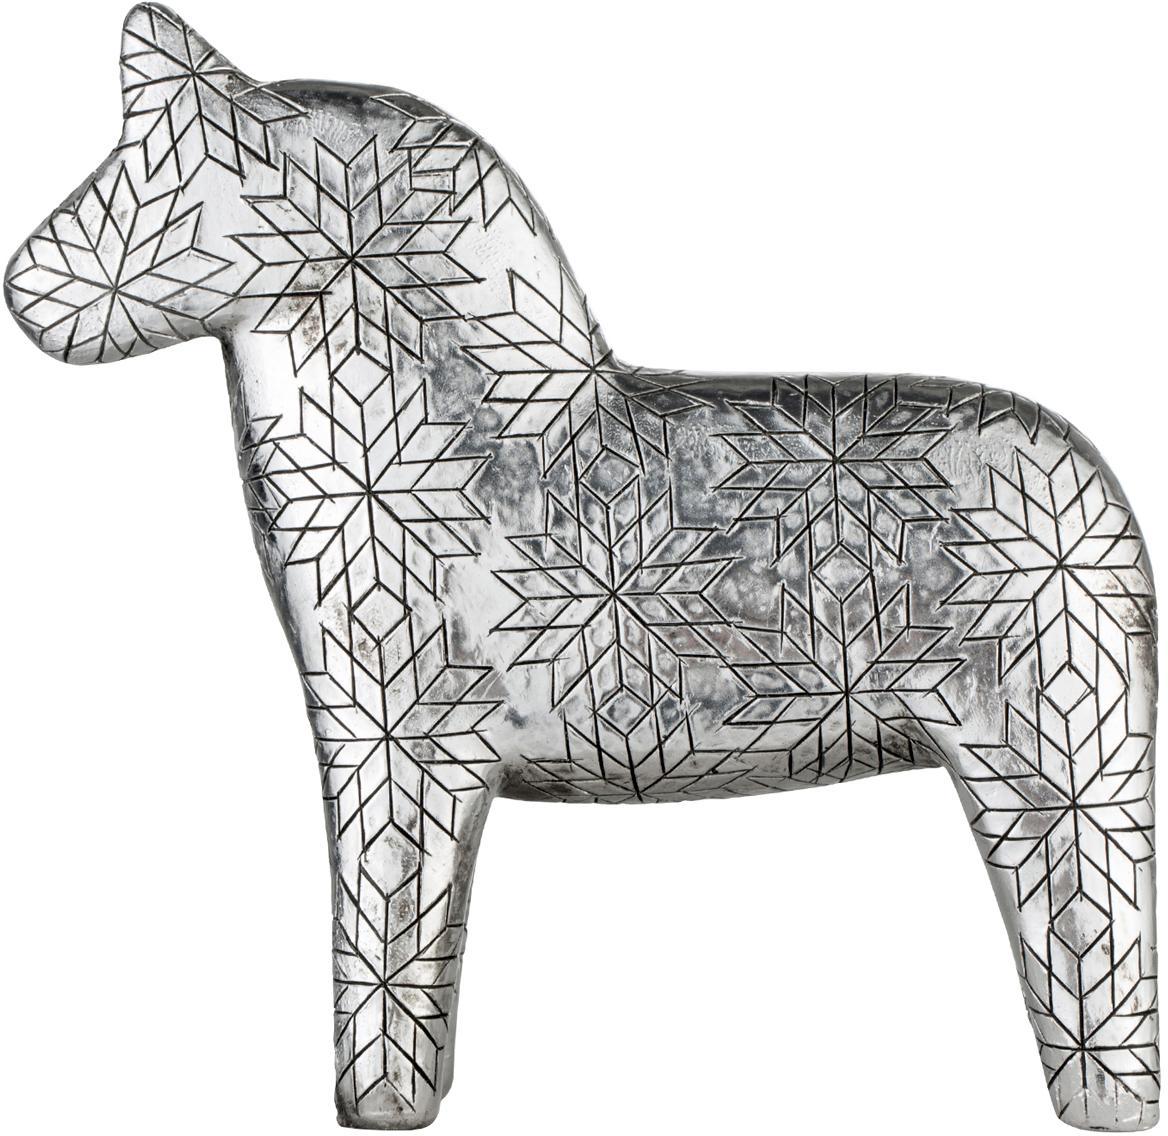 Deko-Objekt Serafina Horse, Polyresin, Silberfarben, 13 x 13 cm